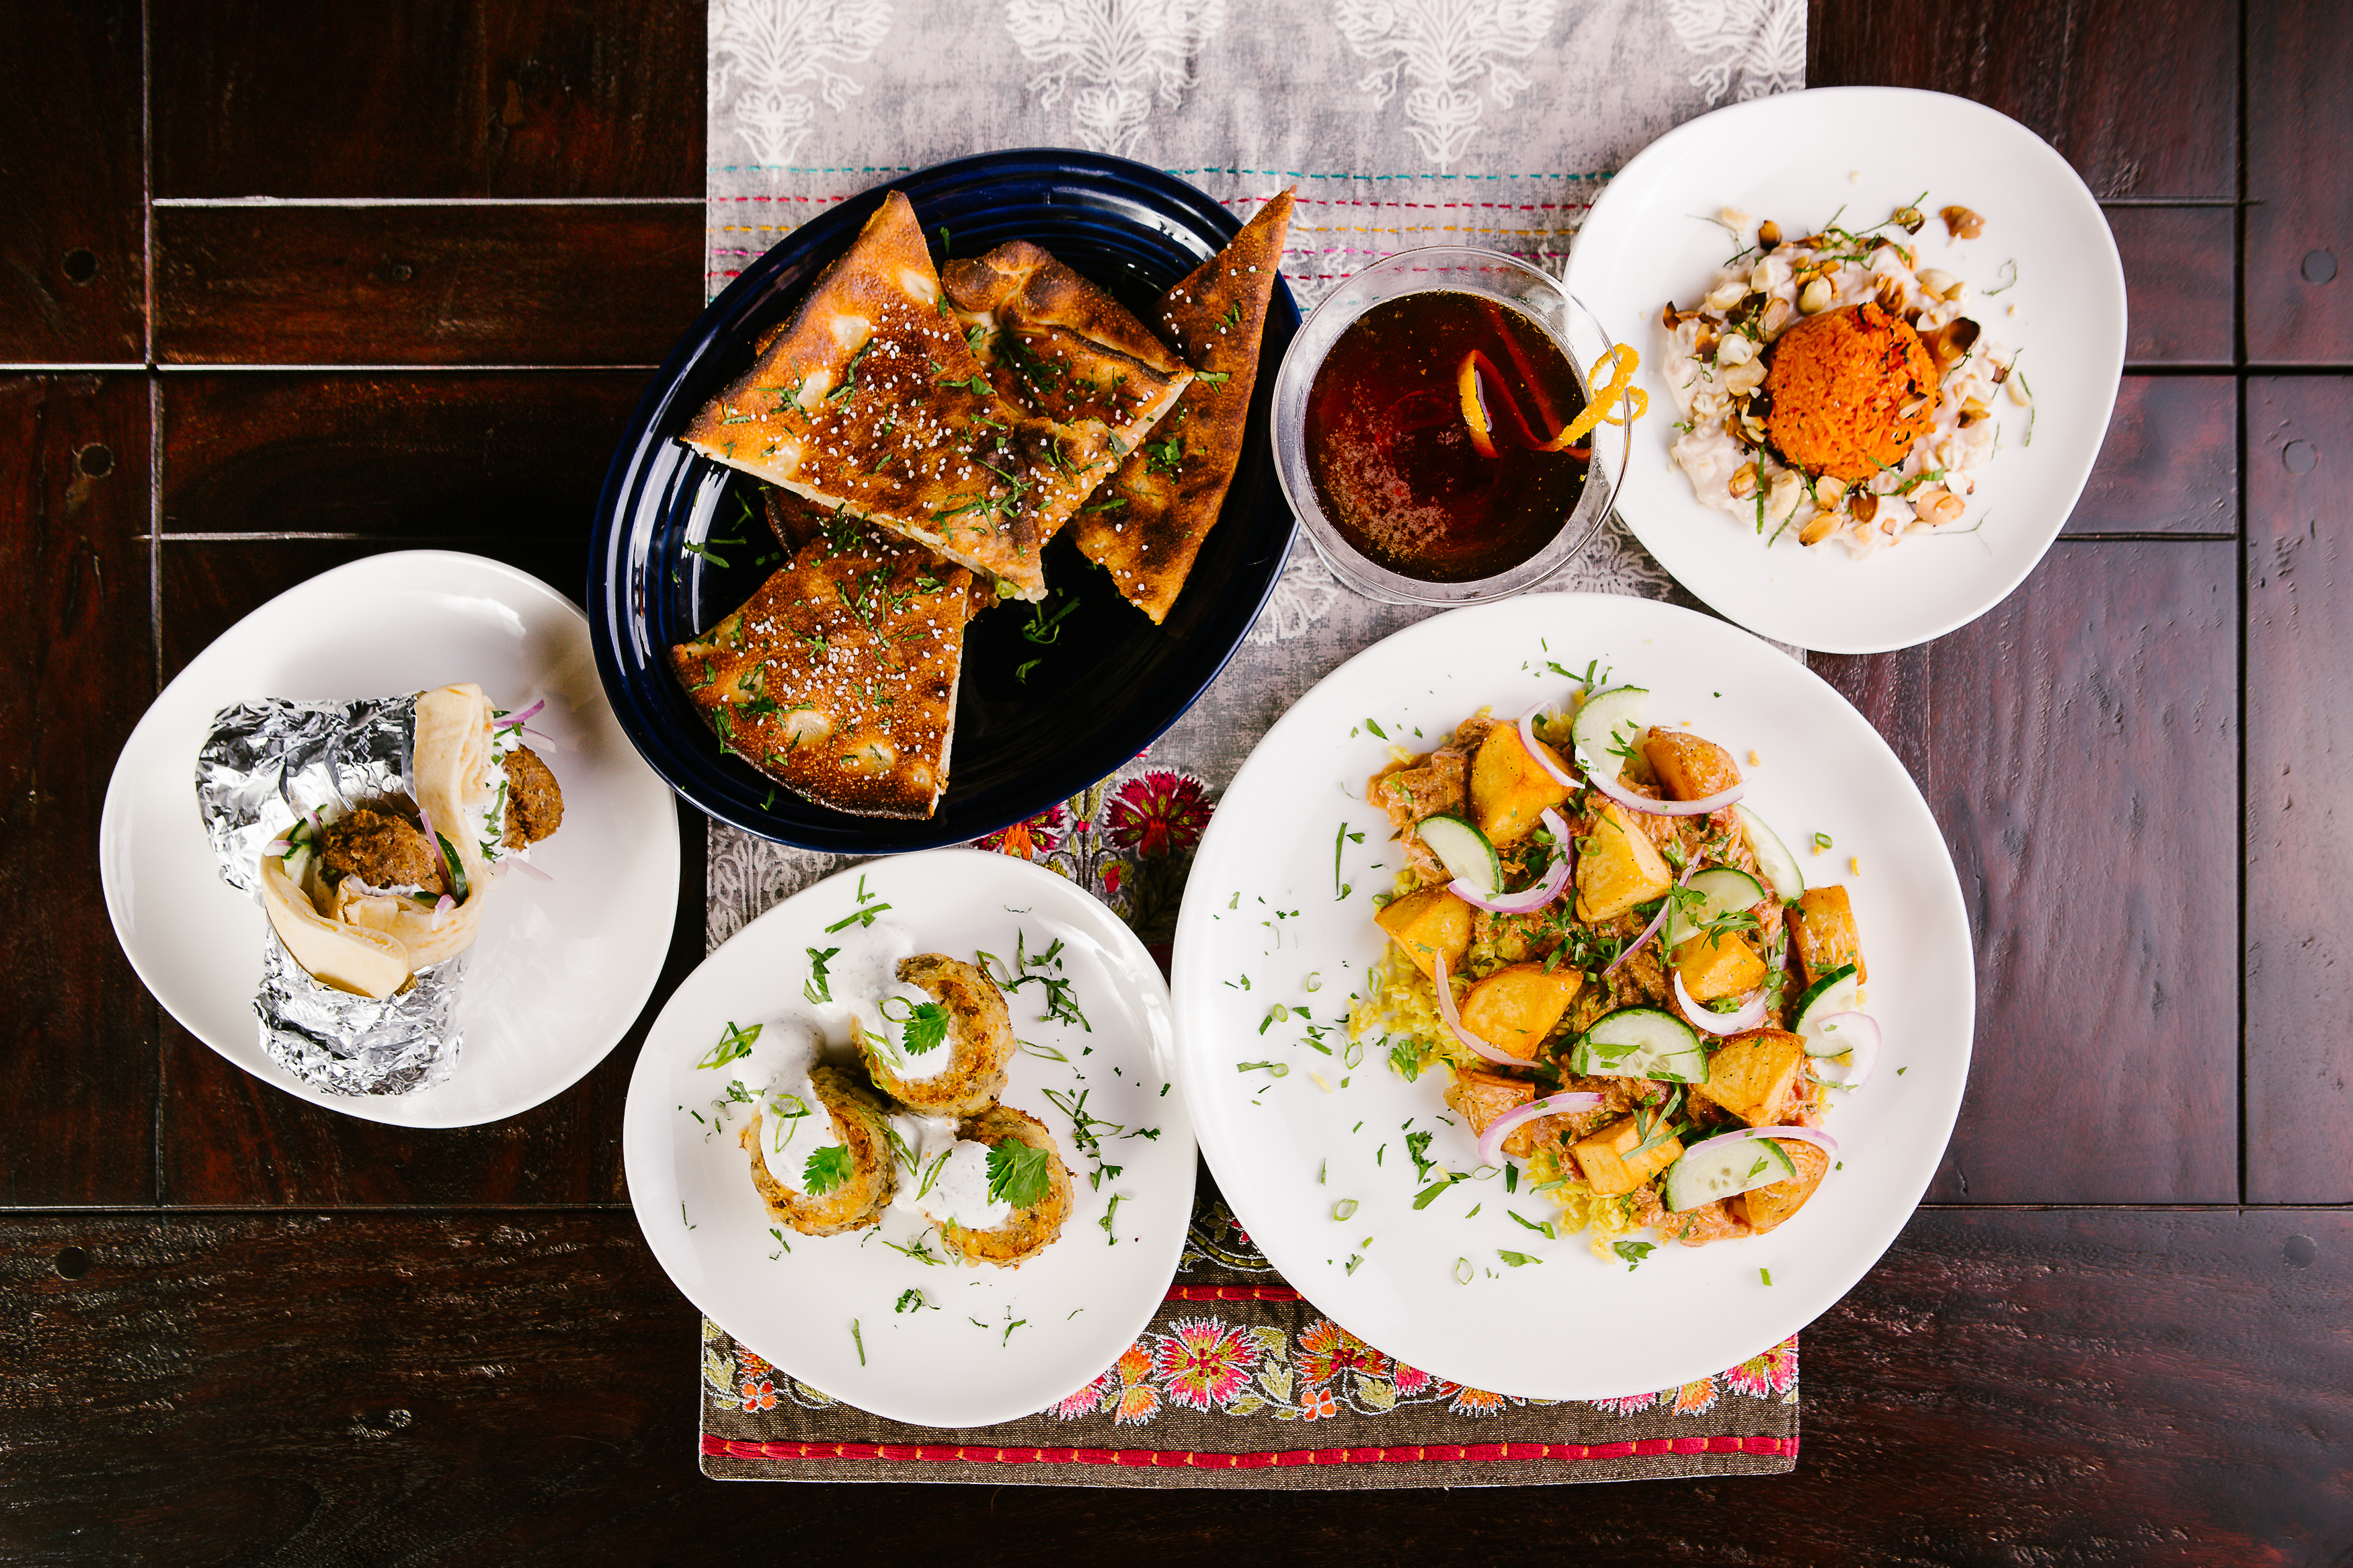 Alamo Drafthouse's Big Sick dishes